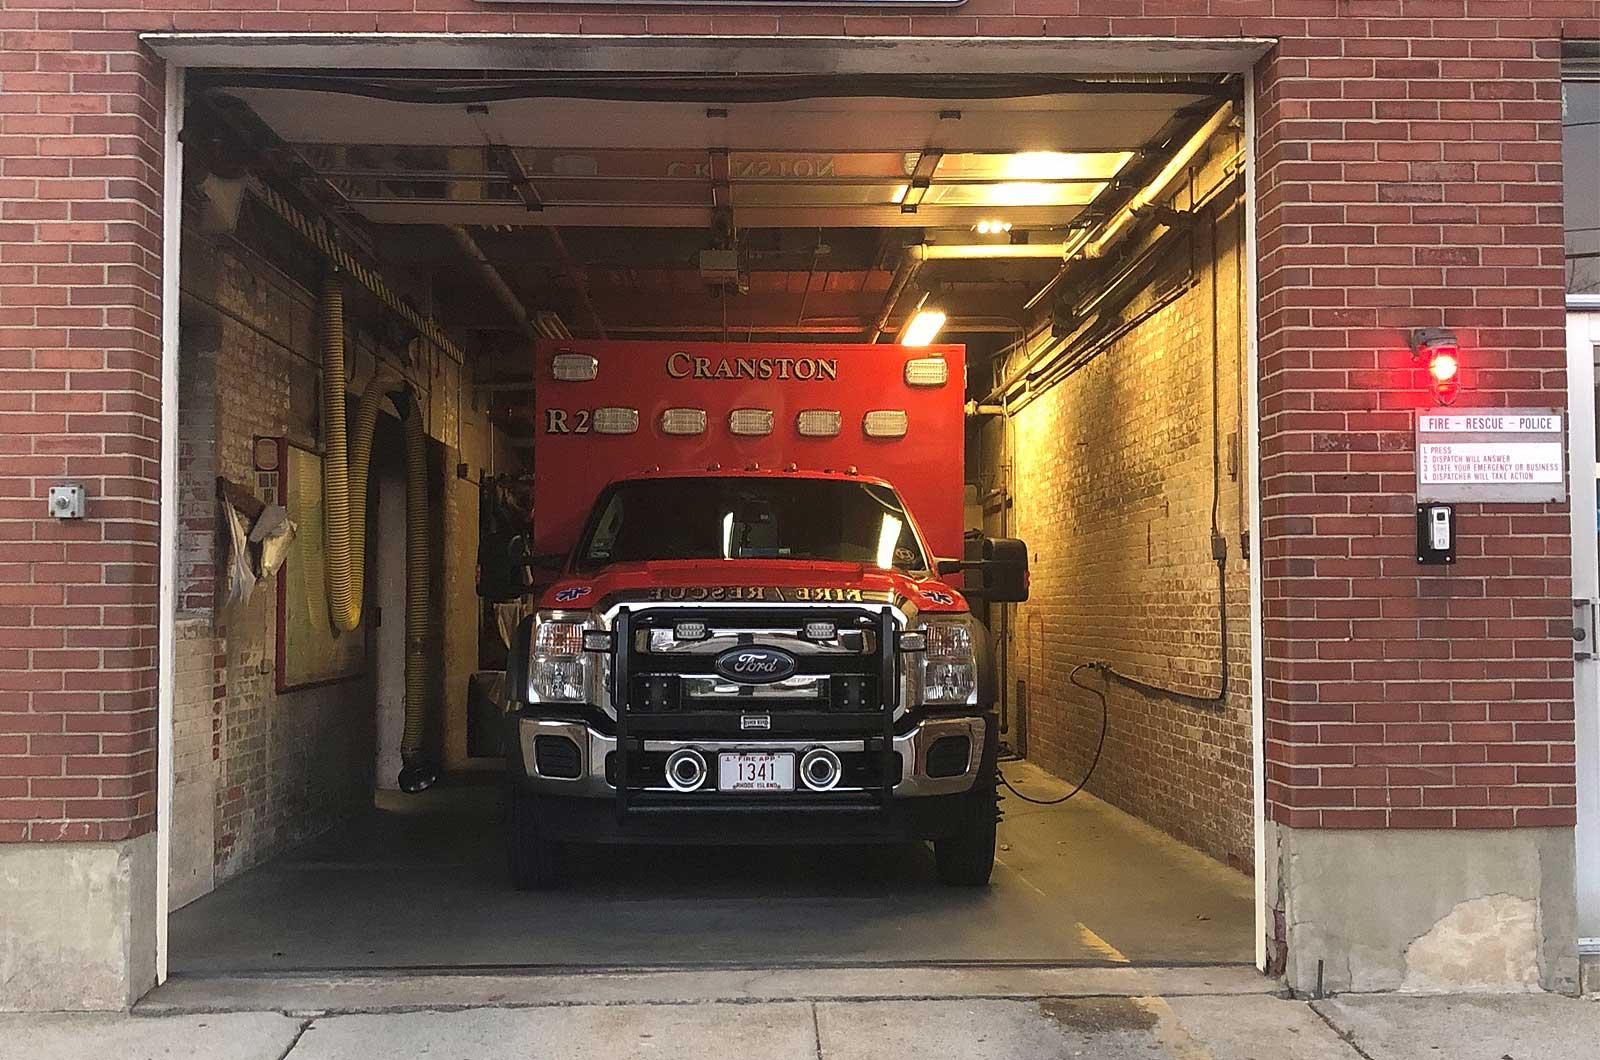 Cranston Fire Department Rescue 2